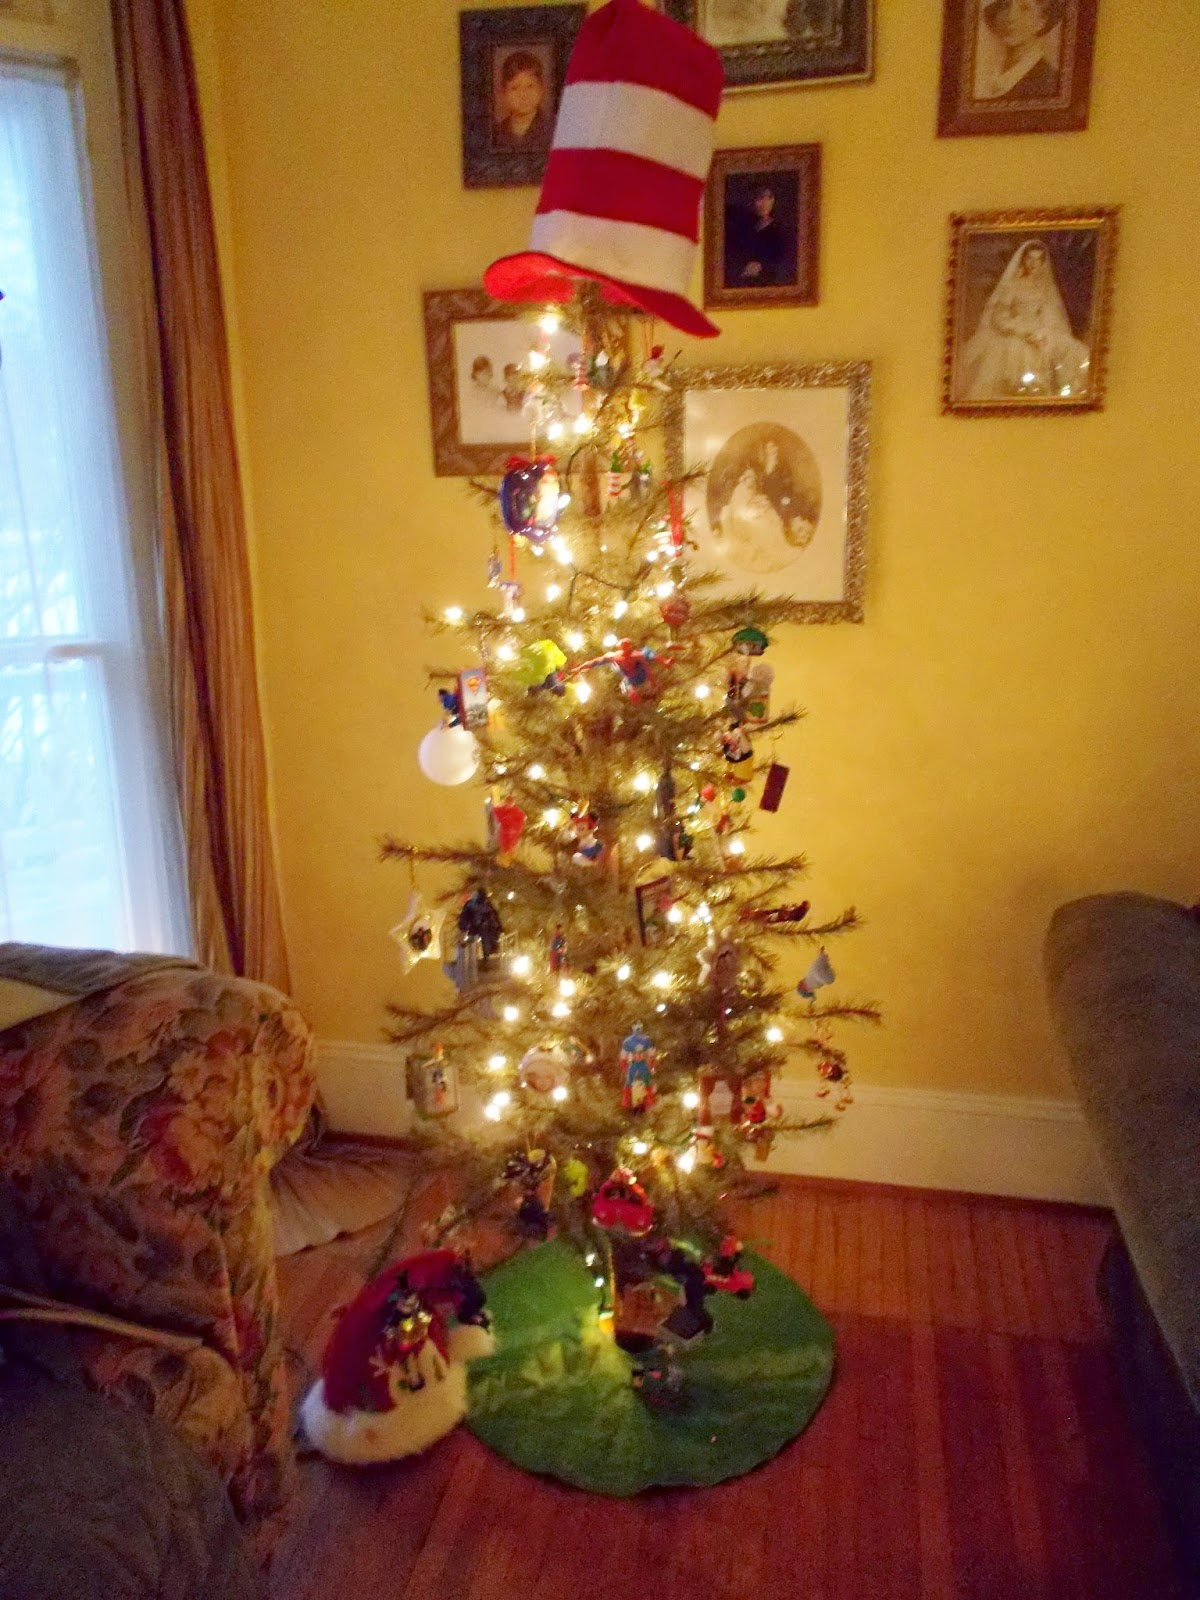 Musings of a Vintage Junkie: O Christmas Tree, O Christmas Tree...